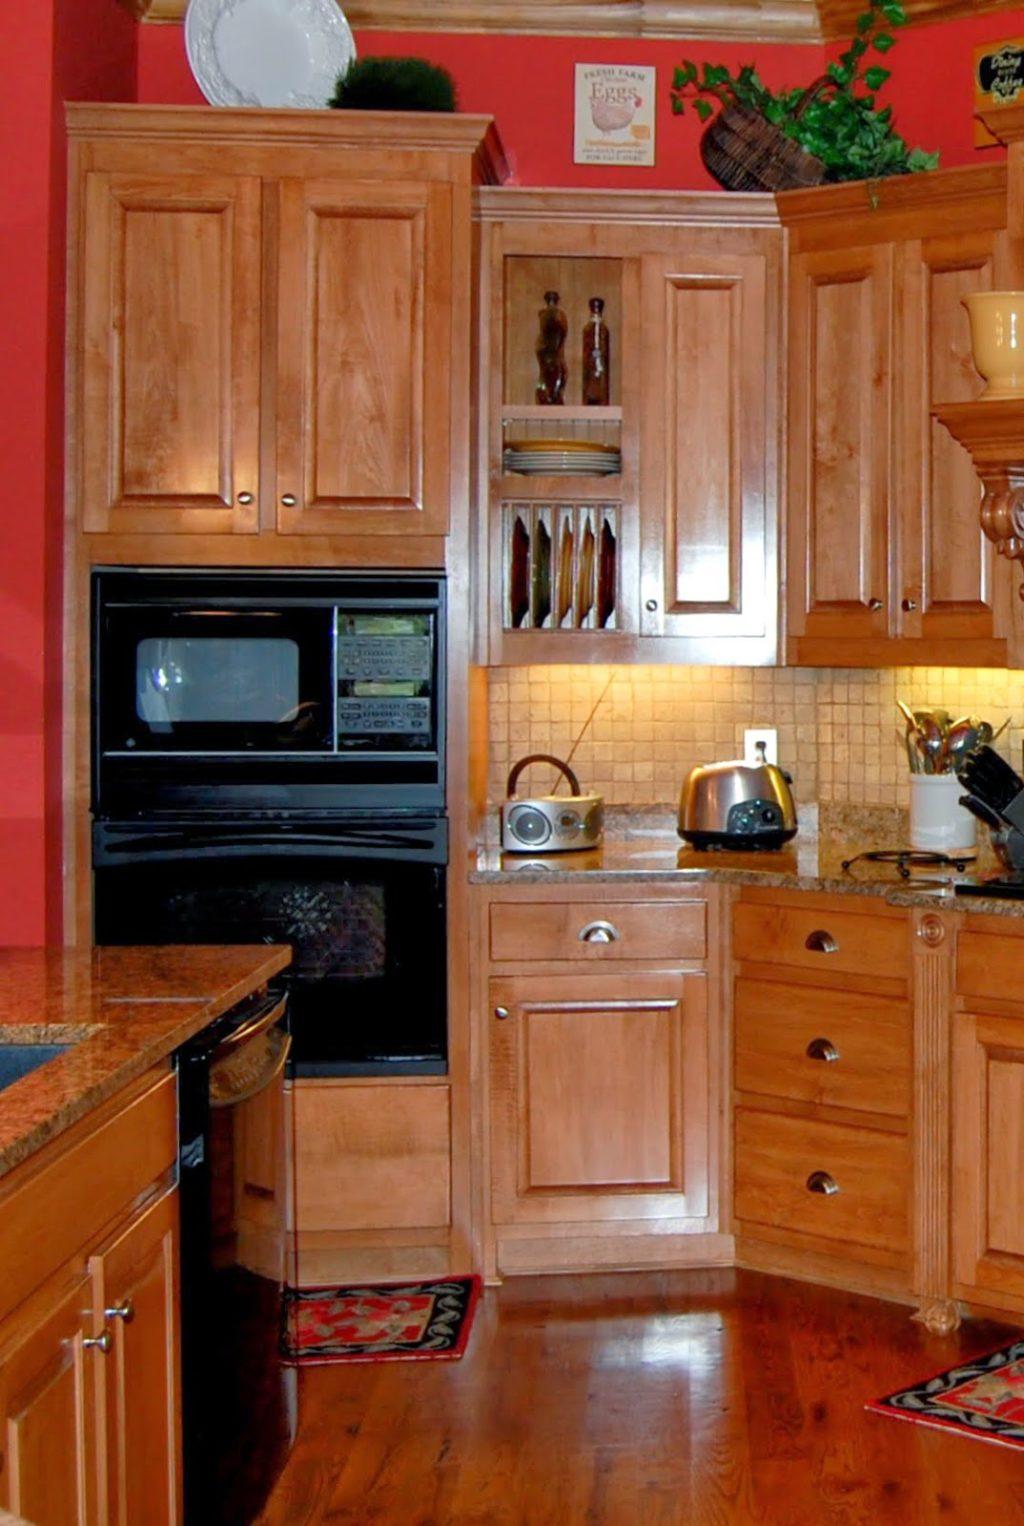 project kitchen cabinets update duke manor farm. Black Bedroom Furniture Sets. Home Design Ideas